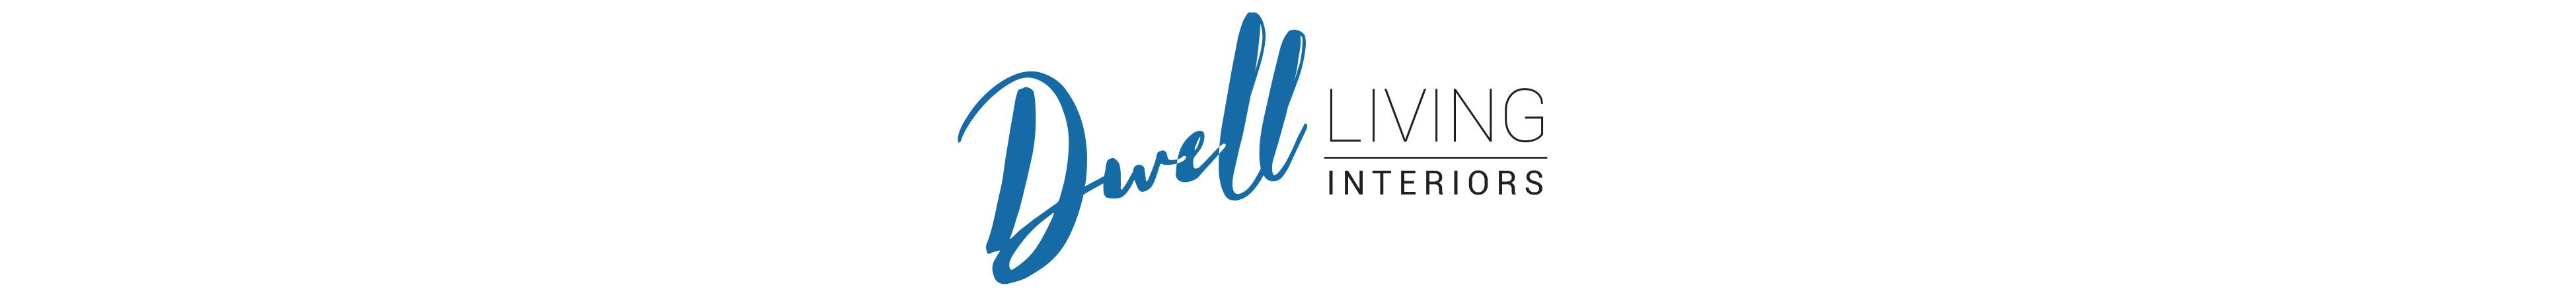 Dwell Living Interiors